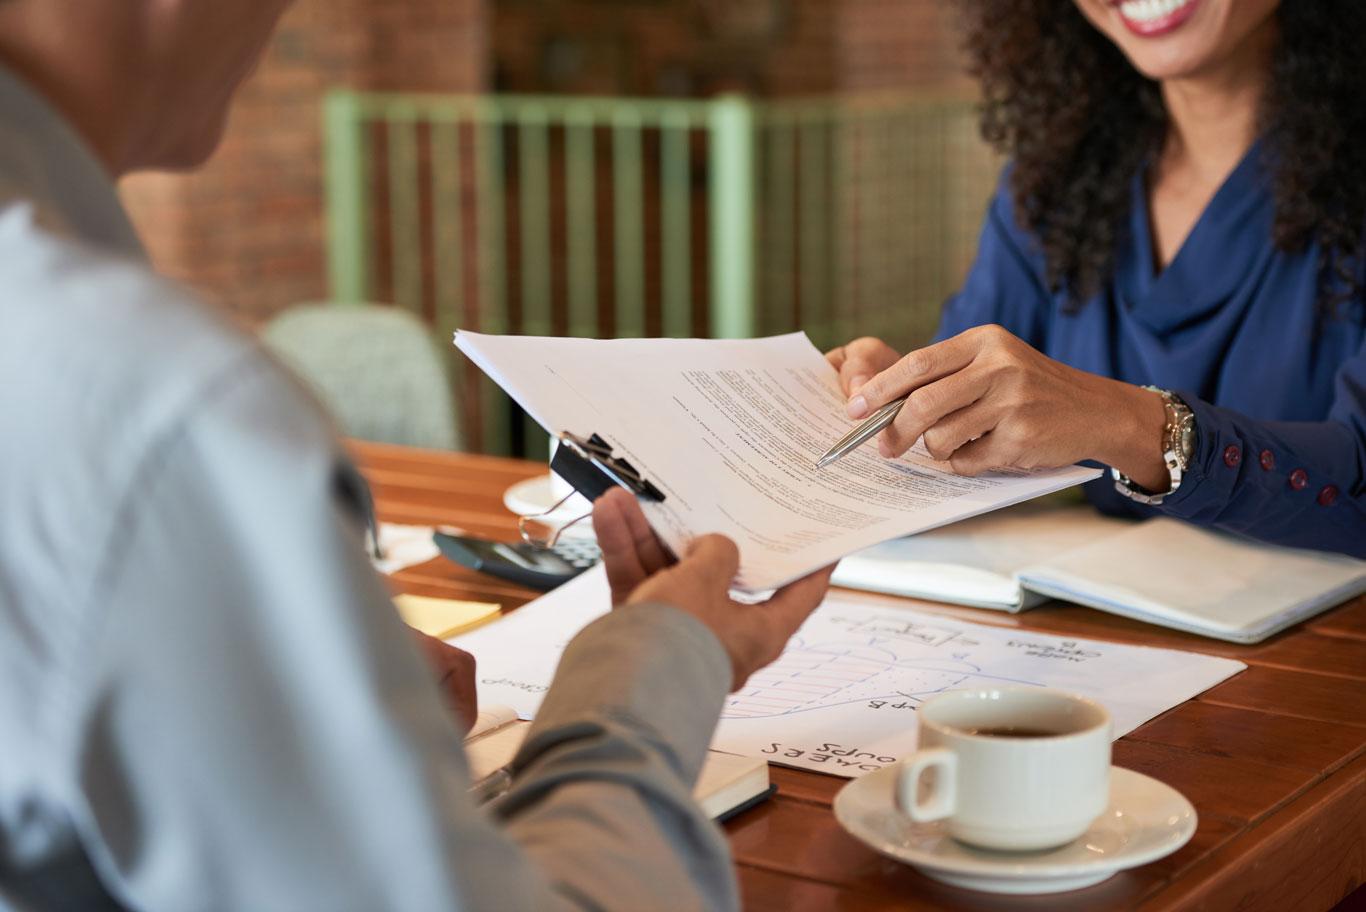 Homologación de títulos de abogados